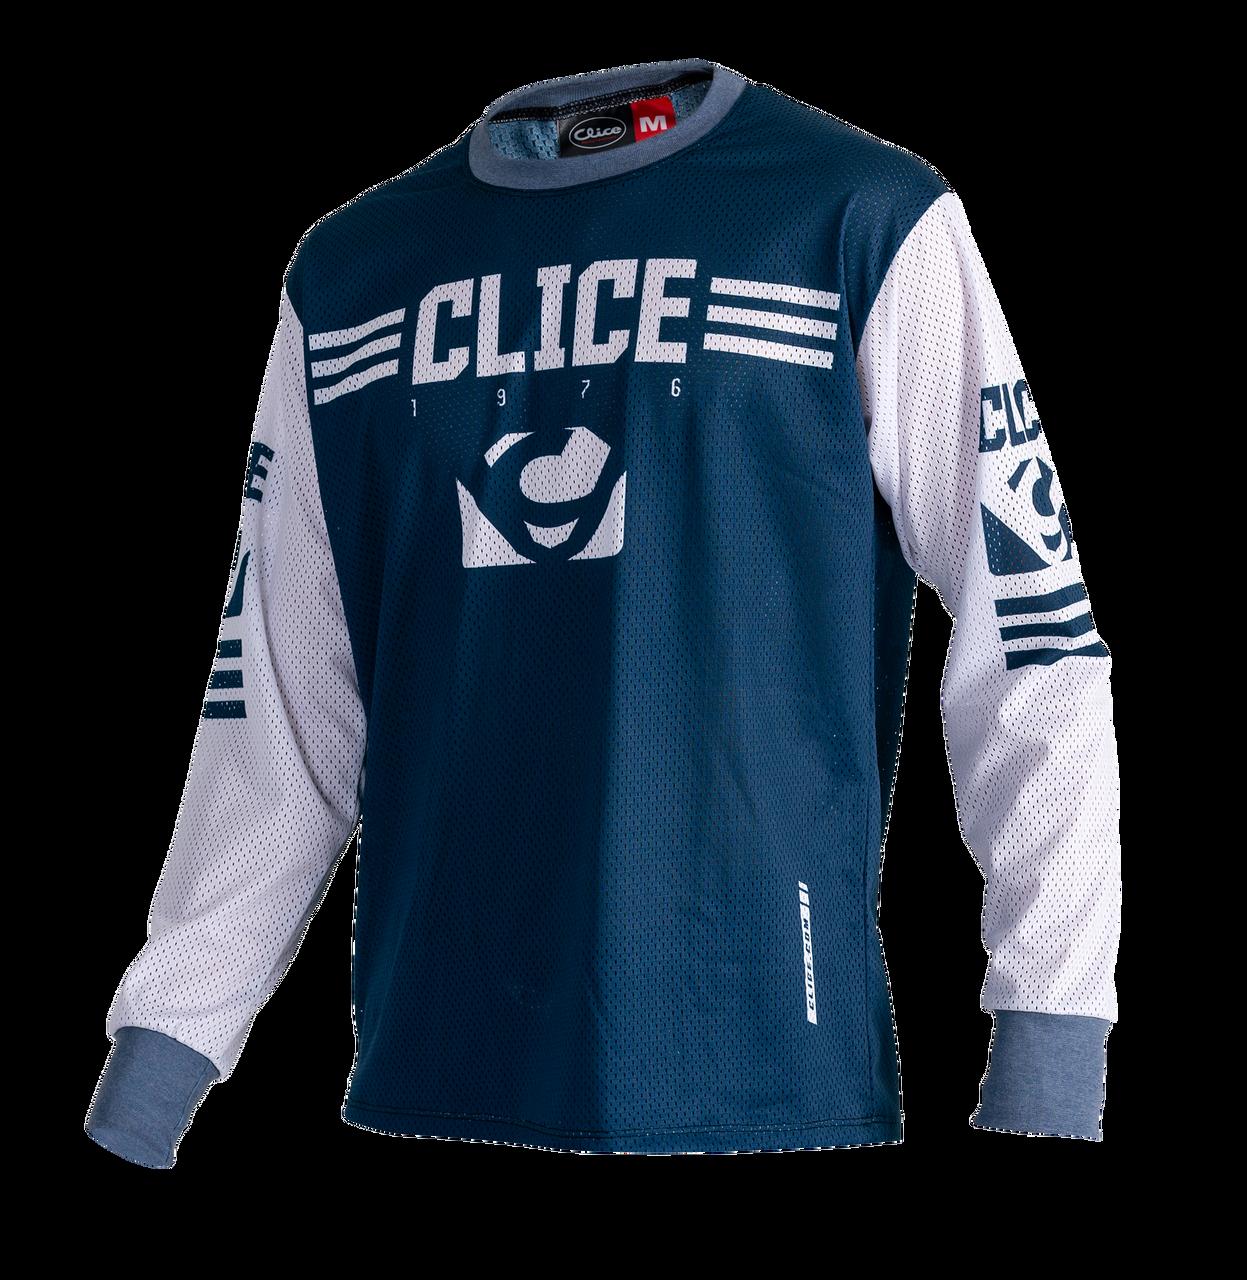 Clice Classic mesh jersey, petrol blue